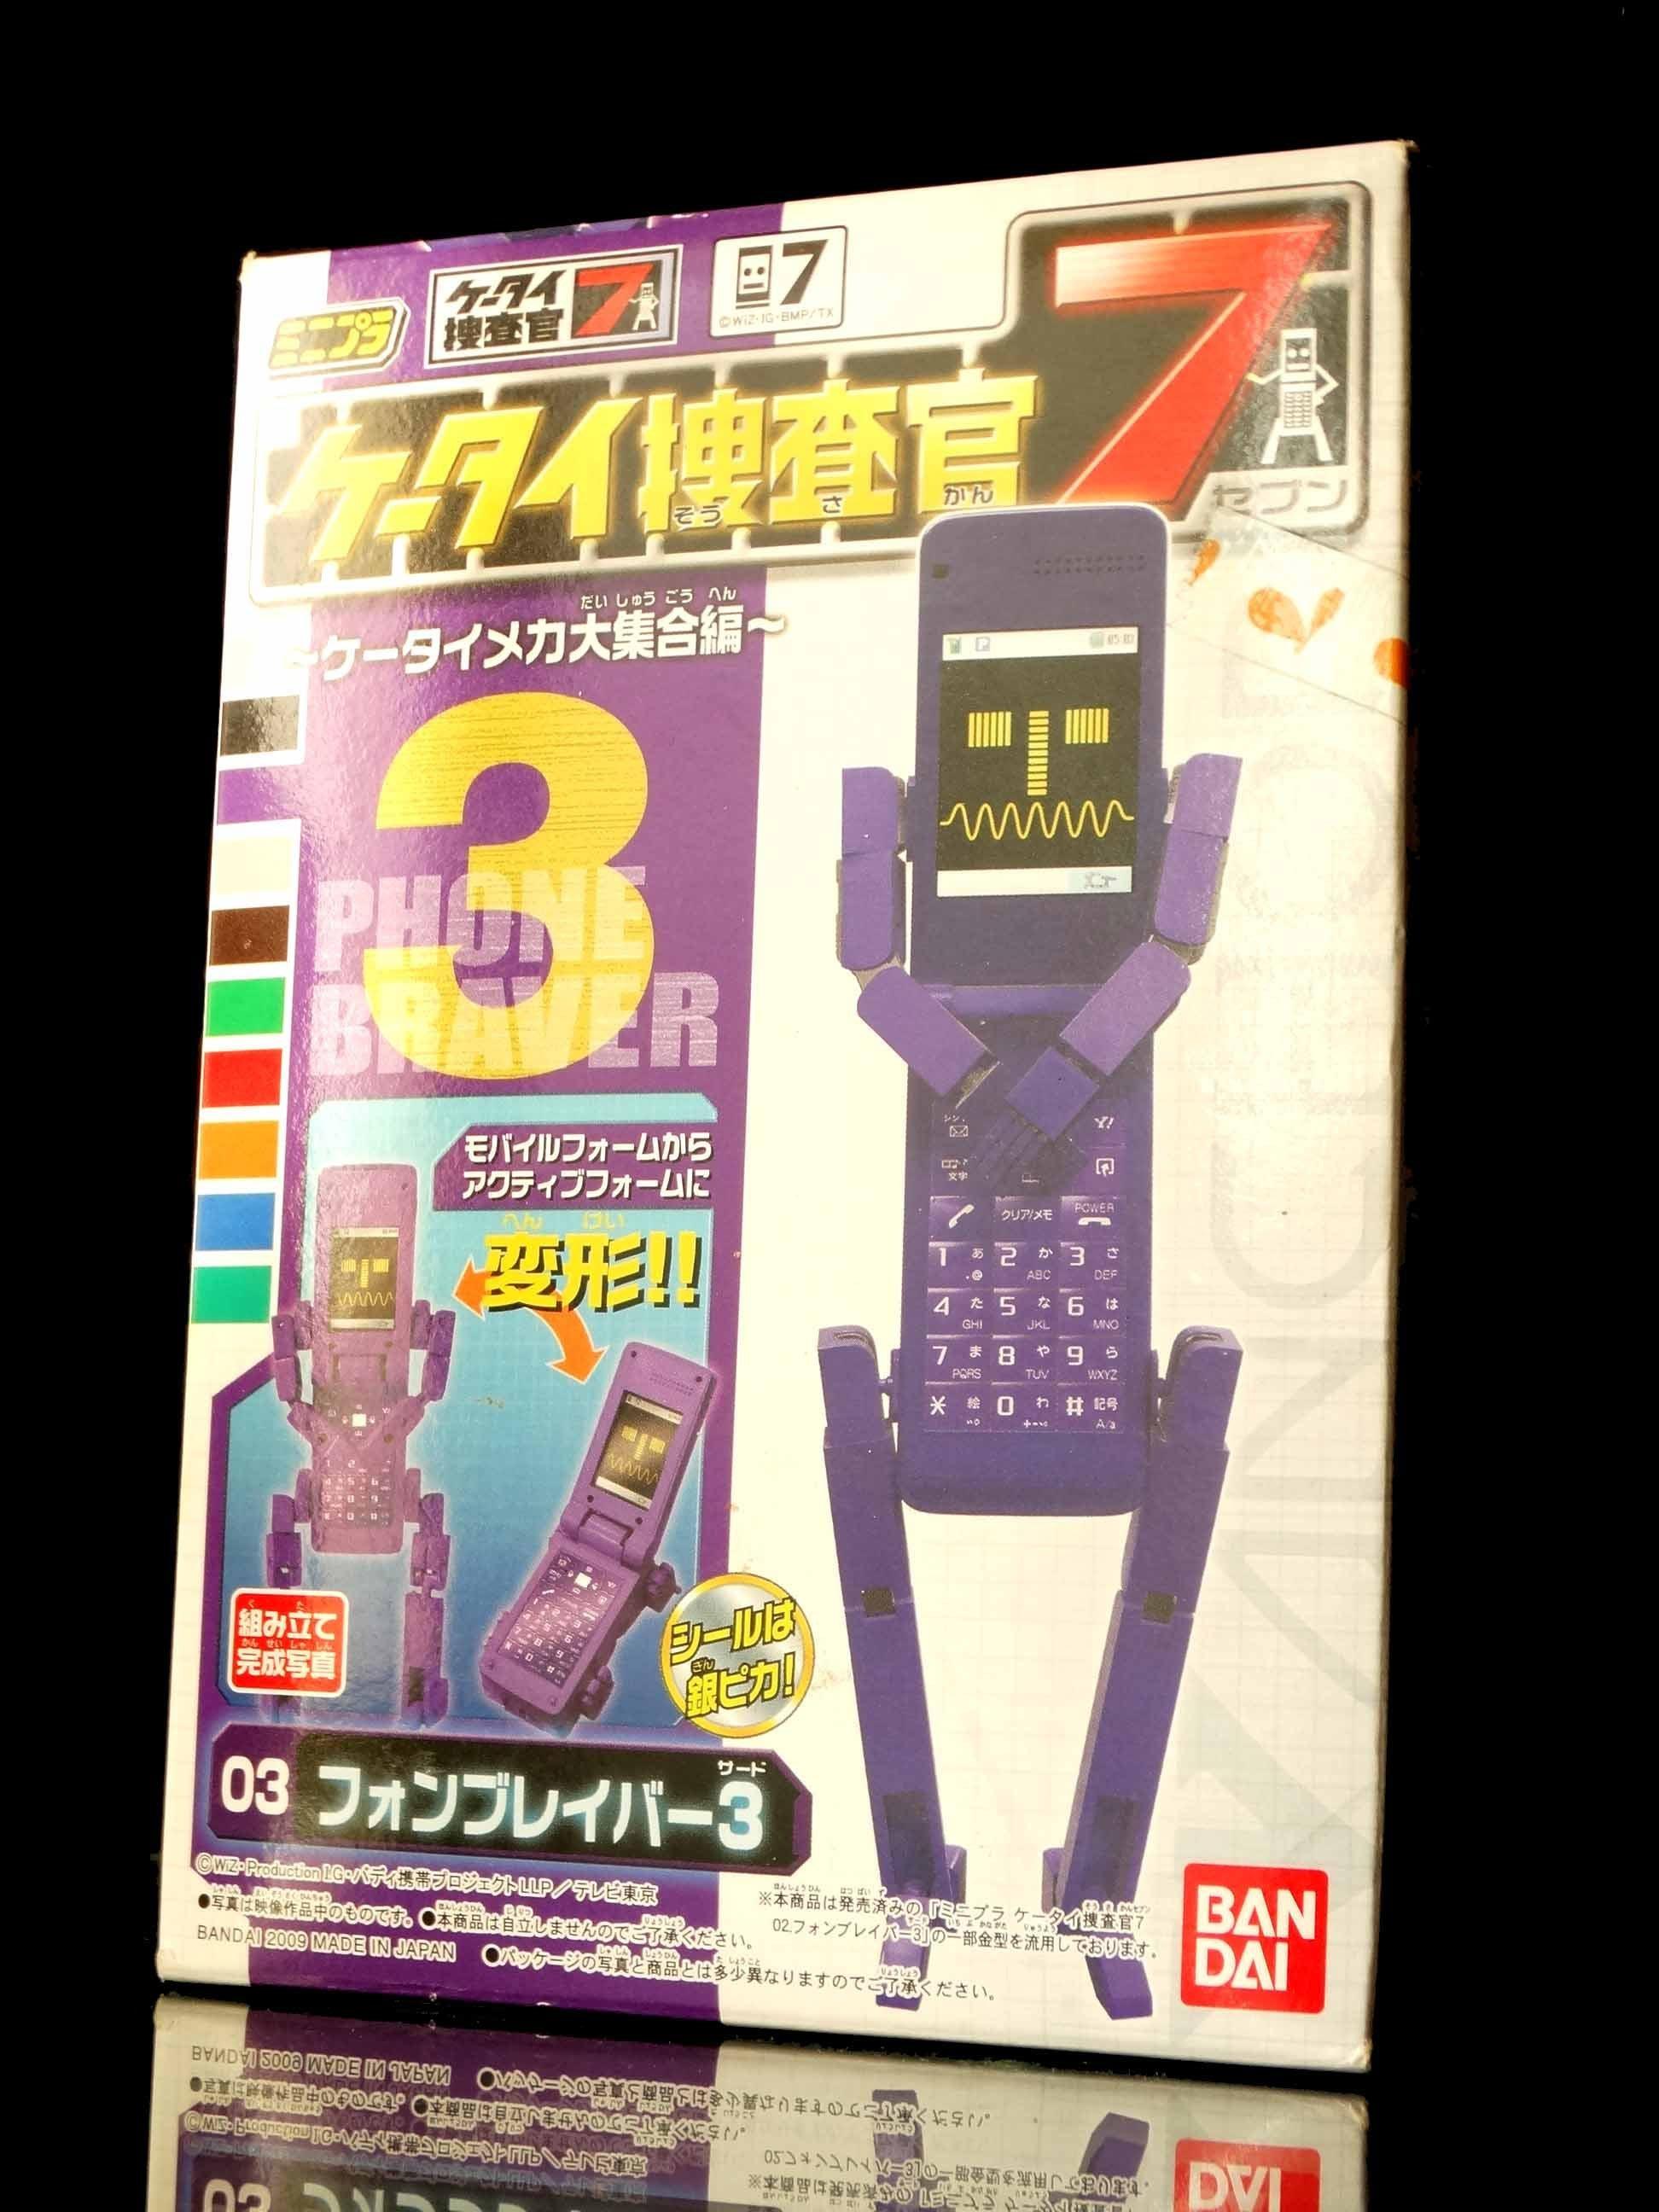 A-12 櫃 : 手機搜查官7 POHONE BRAVER 大集合編 NO. 03  富貴玩具店